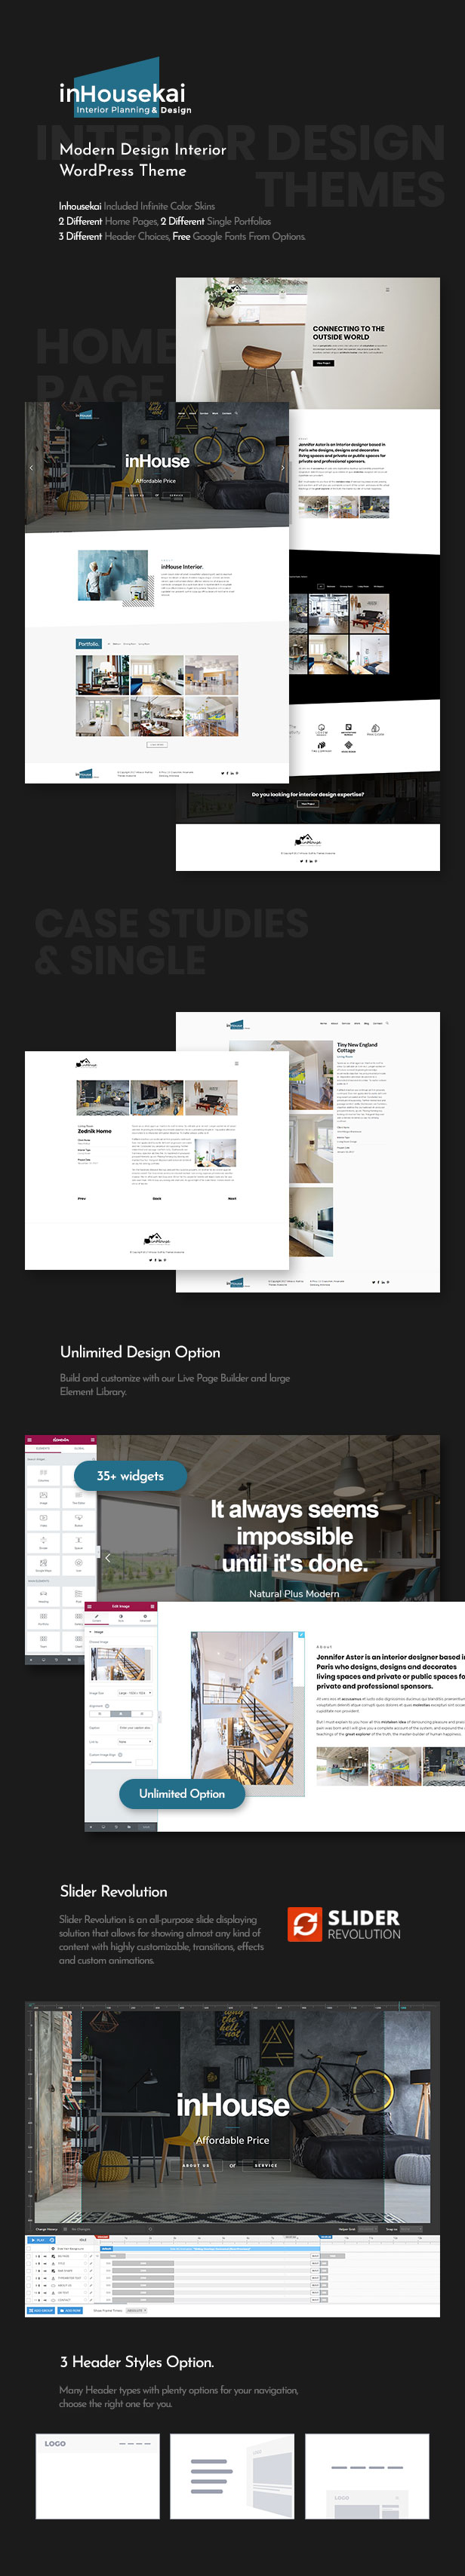 Inhousekai | Modern Design Interior WordPress Theme by themesawesome